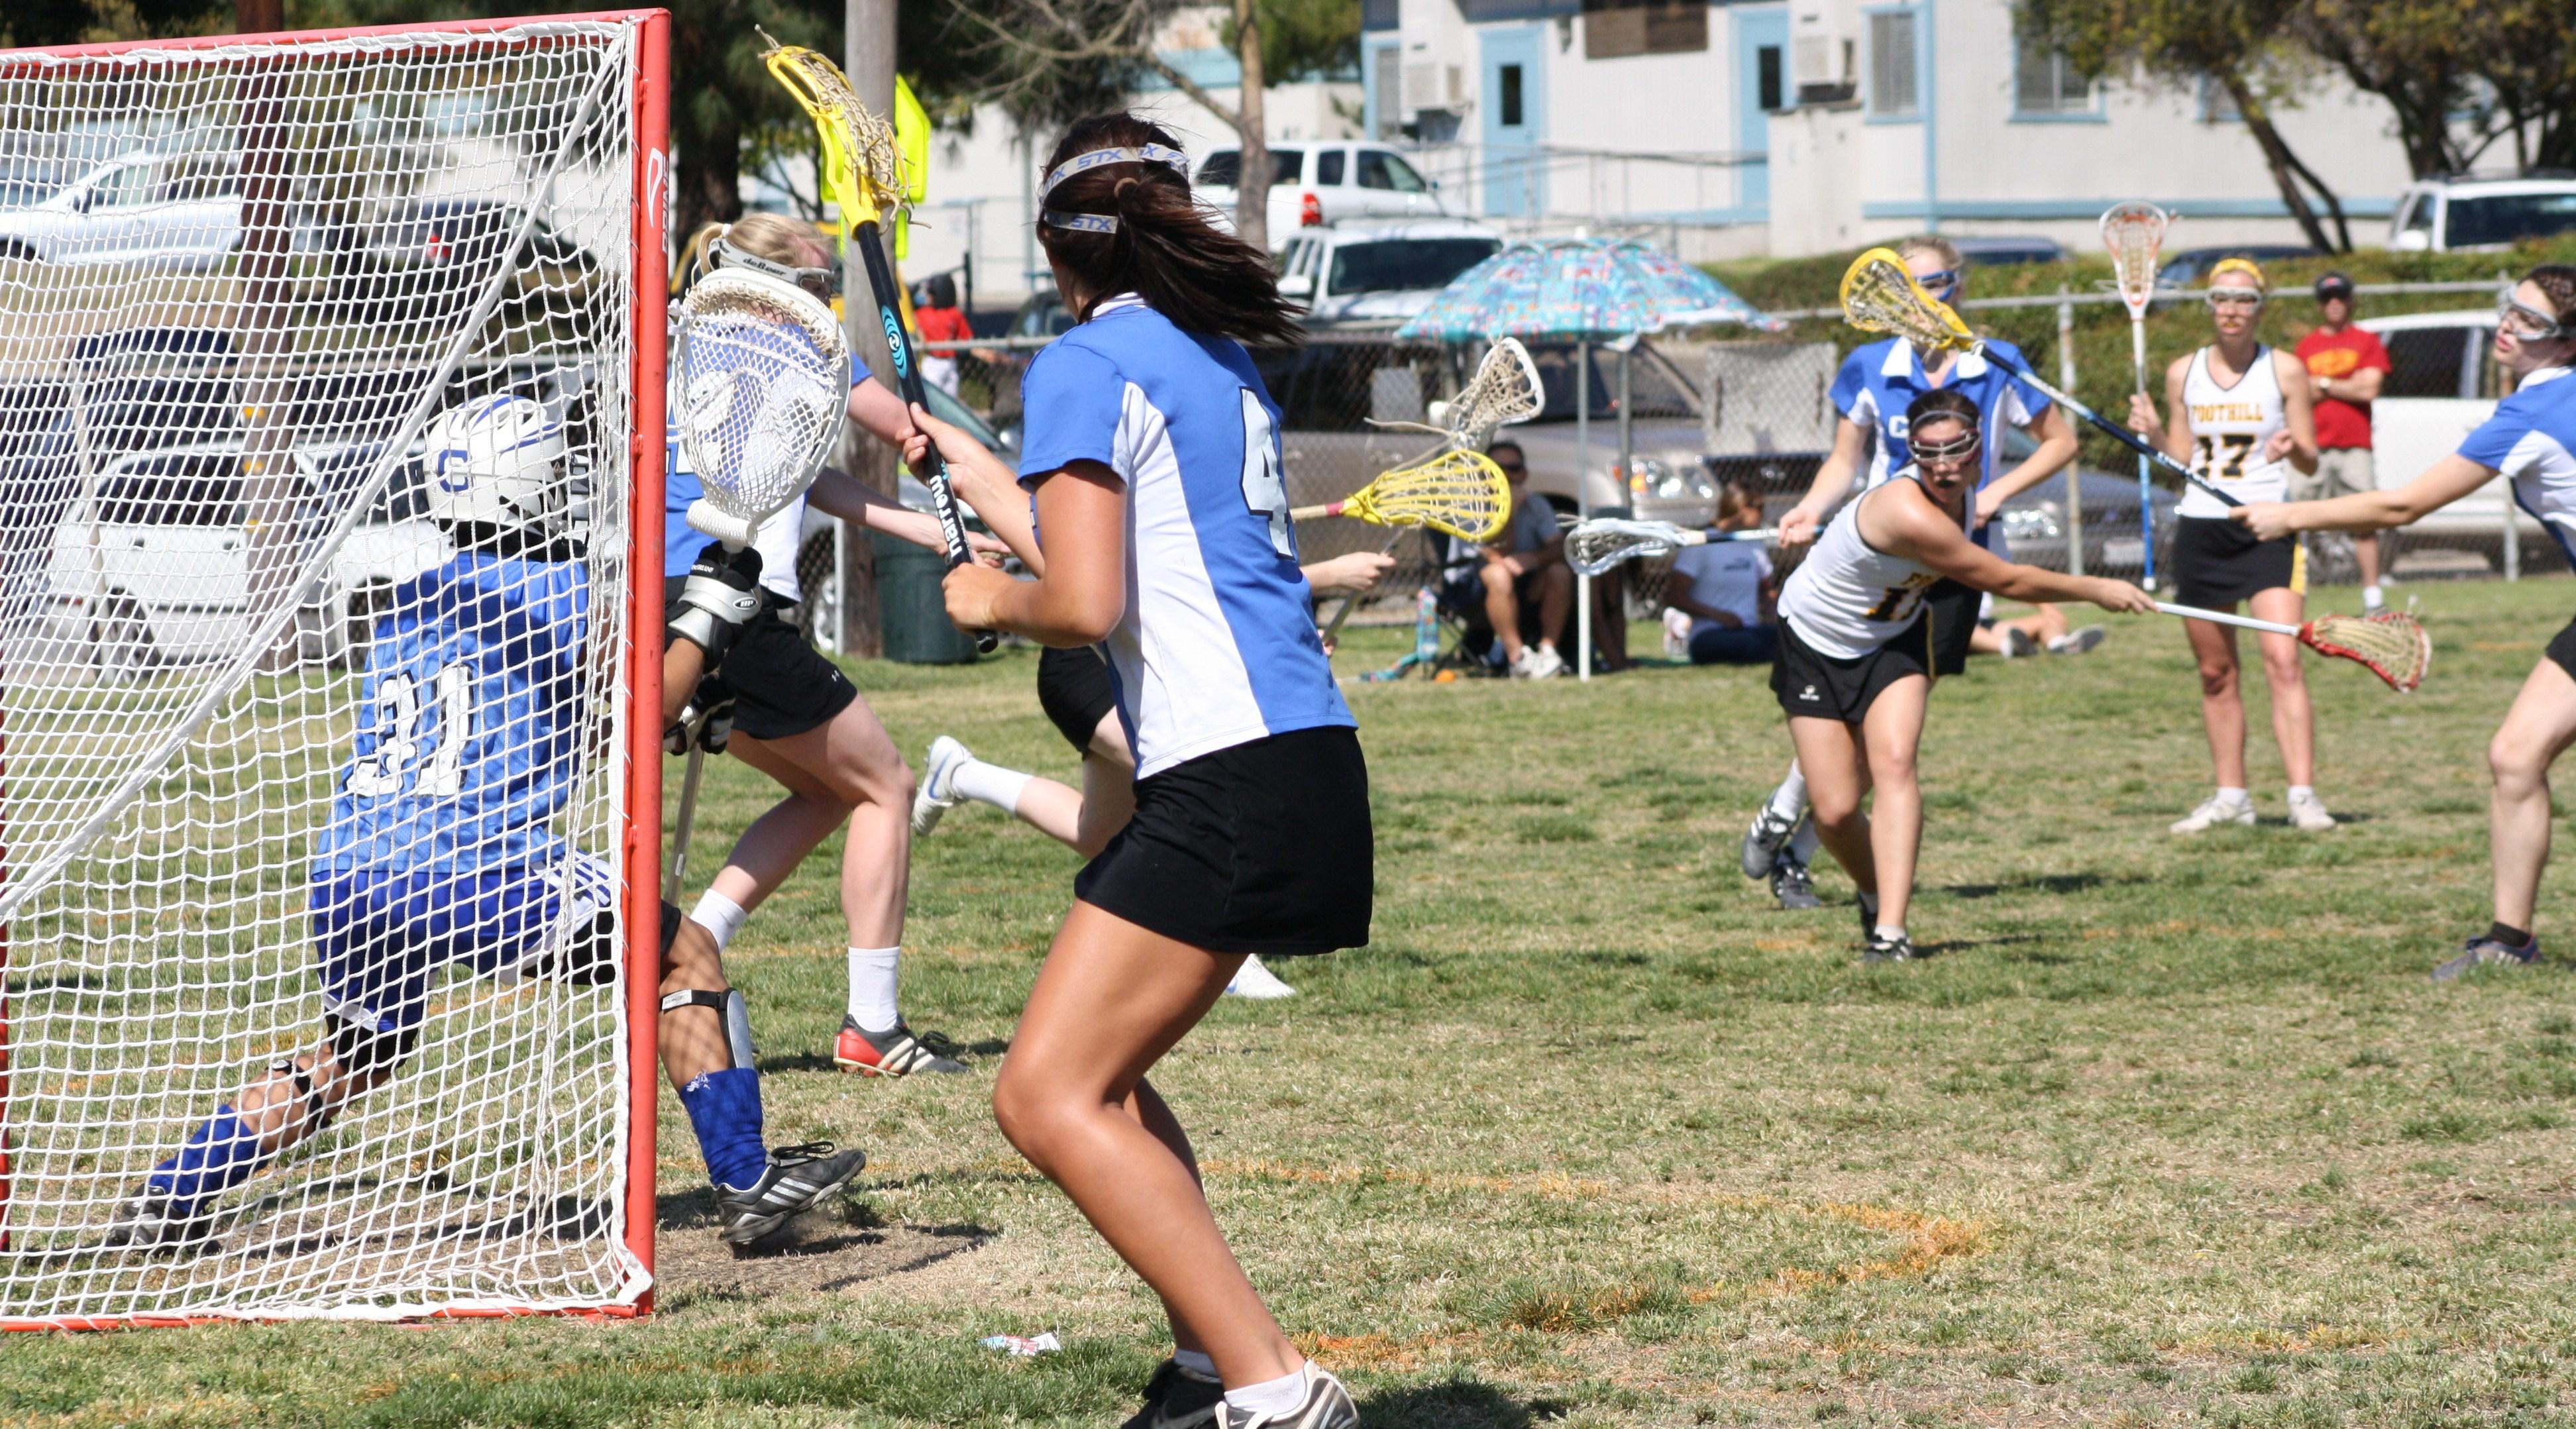 Foothill Varsity Girls Lacrosse kept shooting on Cate Schools goalie...